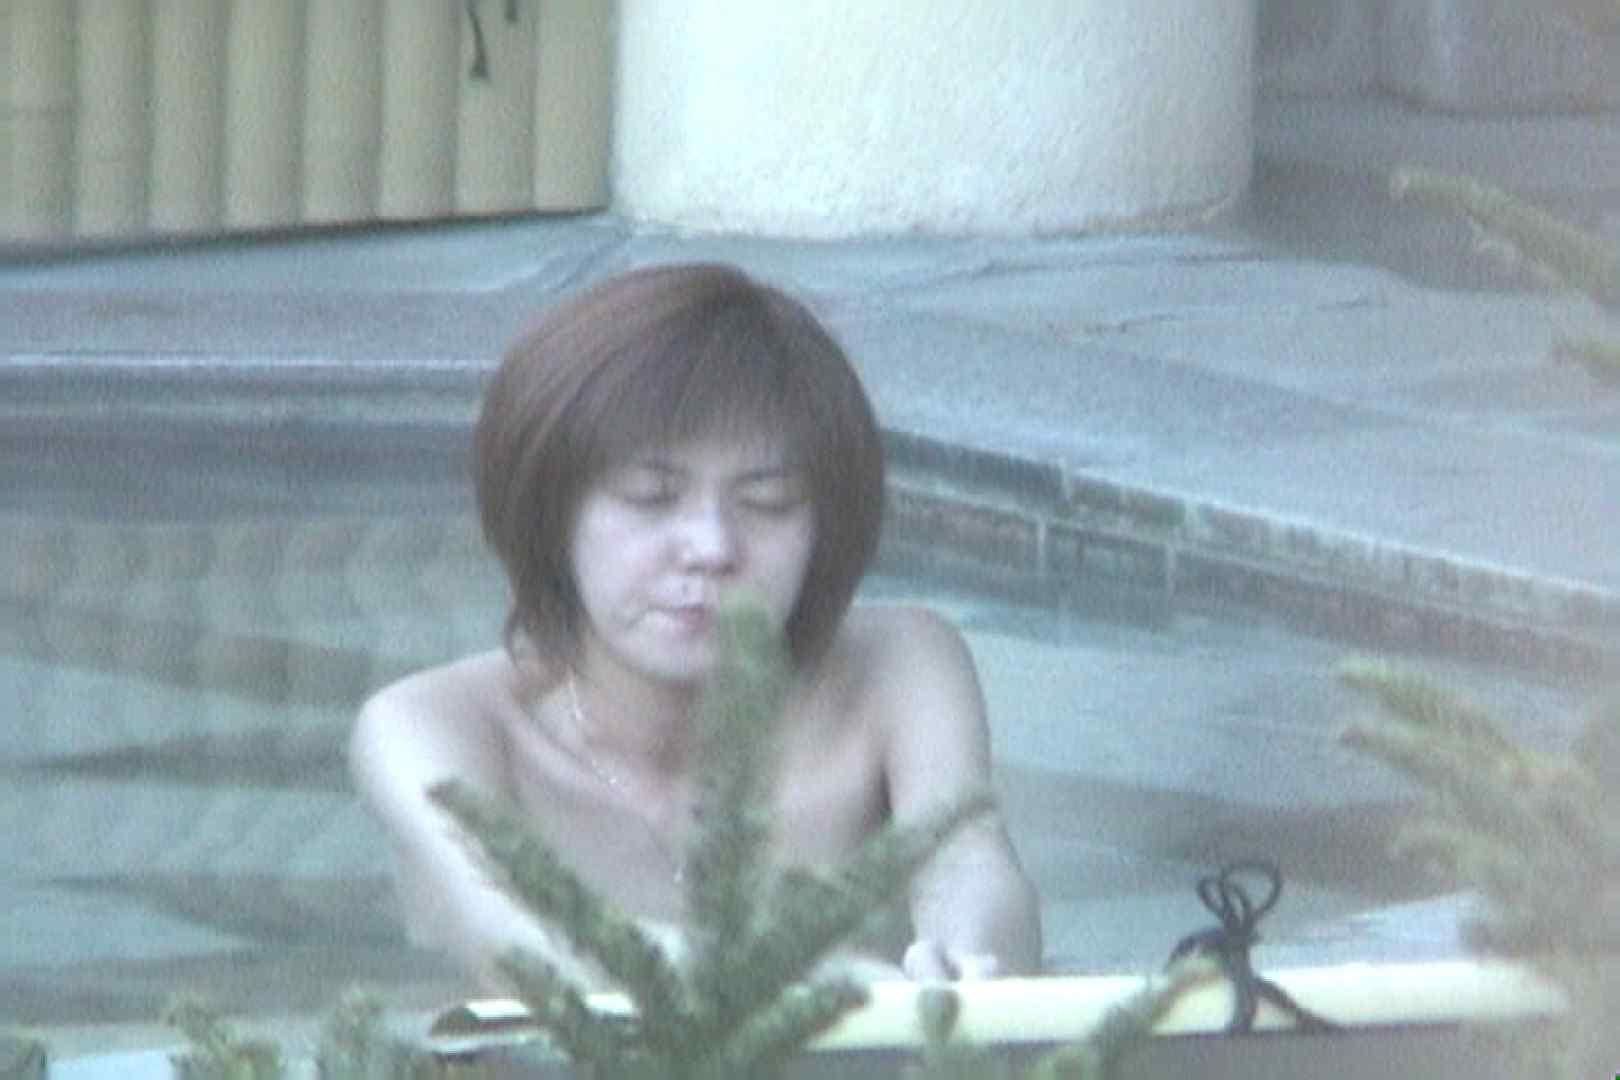 Aquaな露天風呂Vol.560 OLのエロ生活 オマンコ無修正動画無料 46連発 17